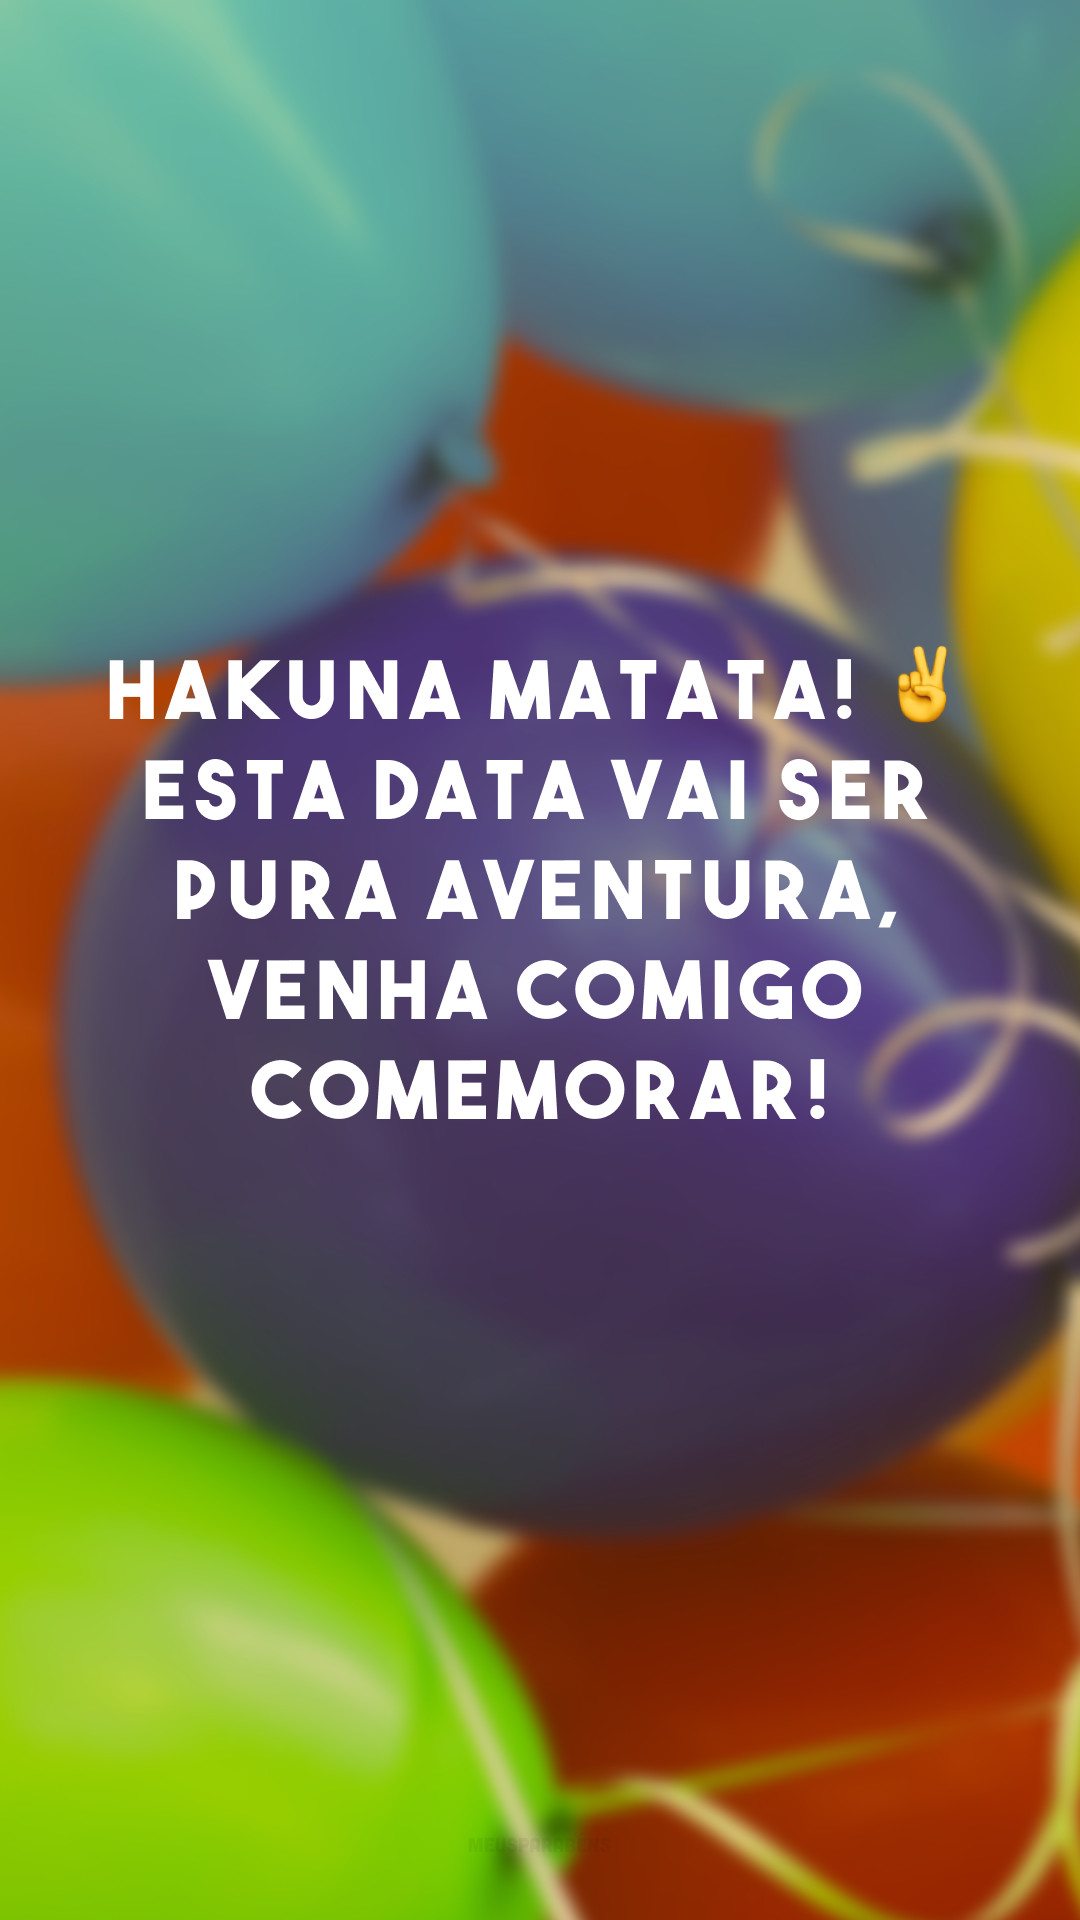 Hakuna Matata! ✌ Esta data vai ser pura aventura, venha comigo comemorar!